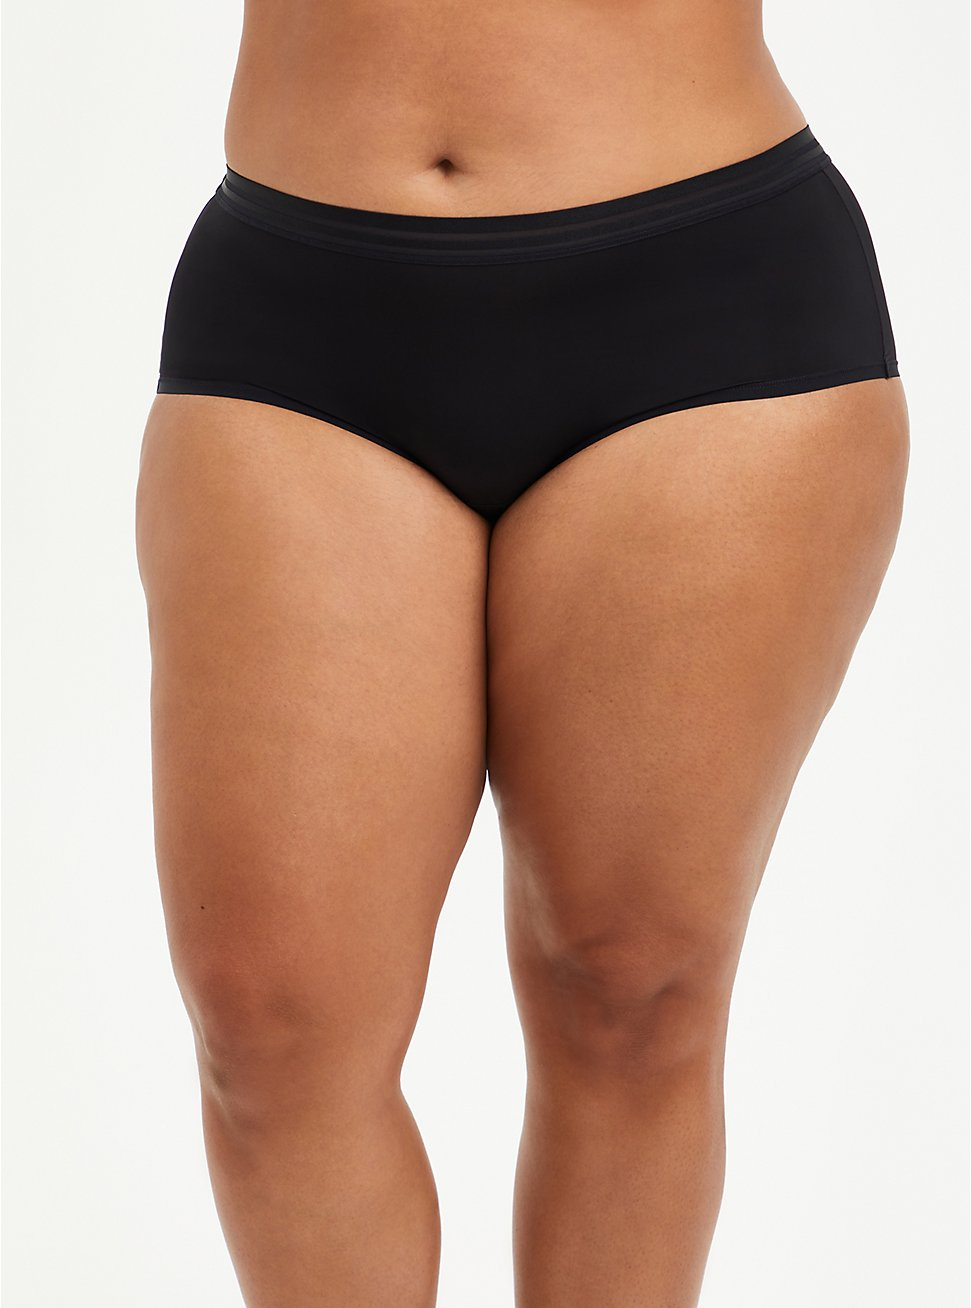 Plus Size Cheeky Panty - Second Skin Black, RICH BLACK, hi-res